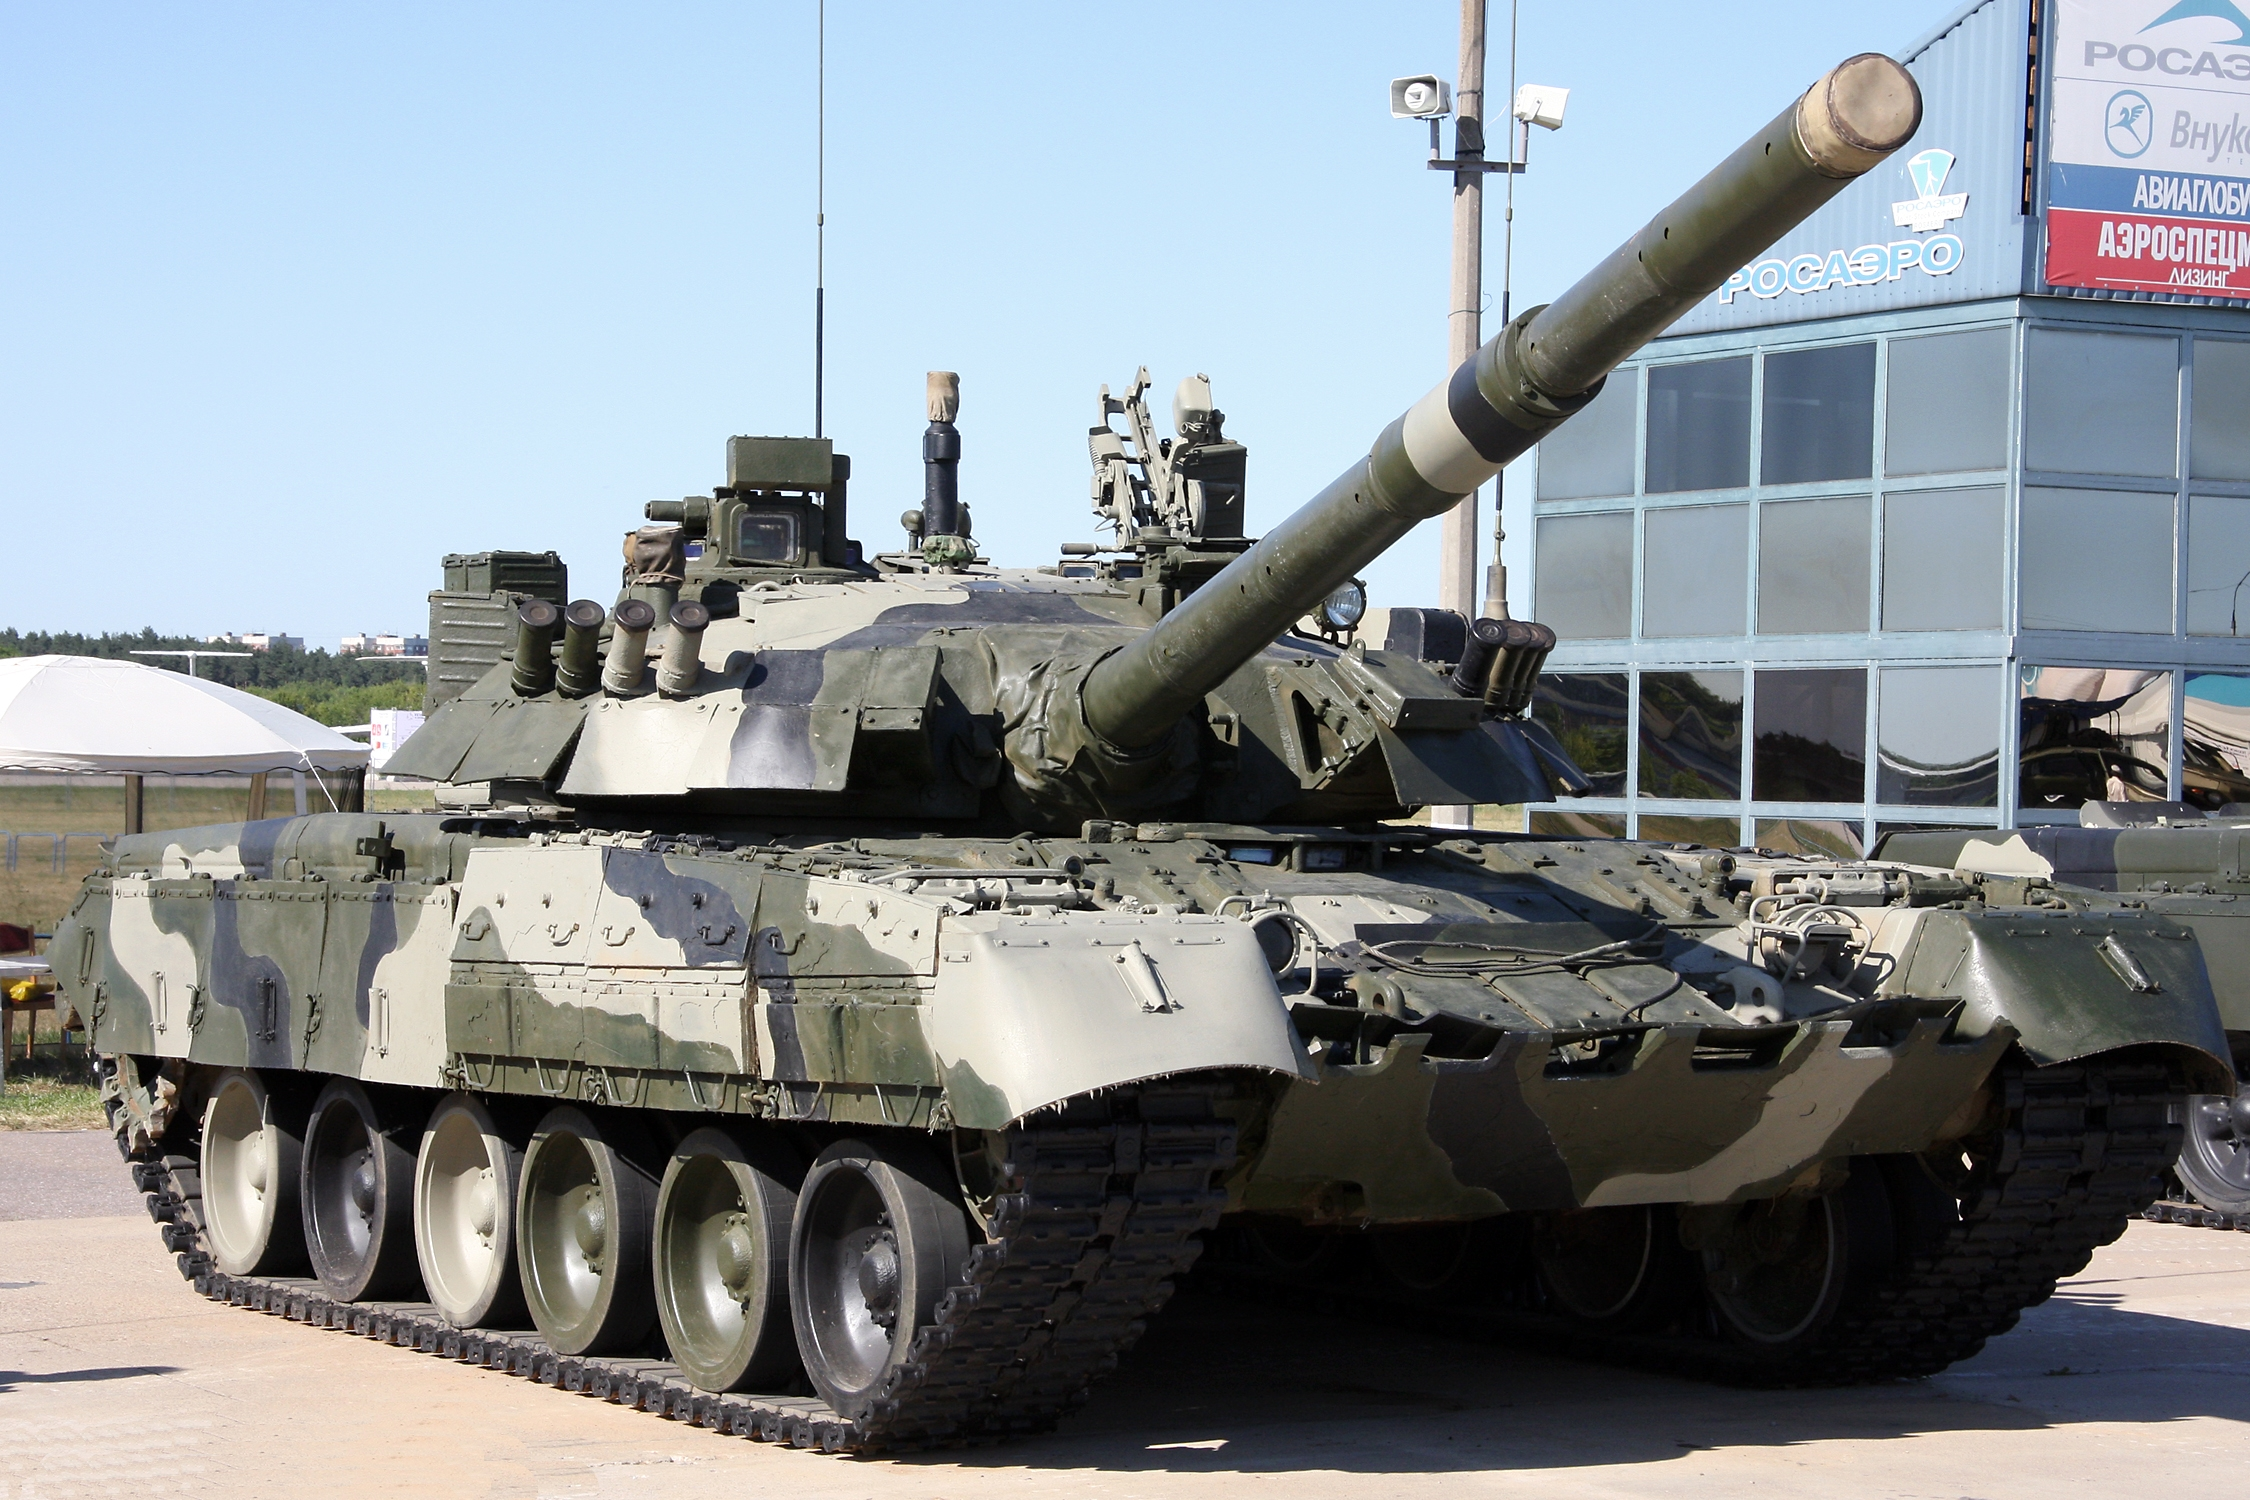 File:T-80 tank, Engineering Technologies 2010.jpg - Wikimedia Commons